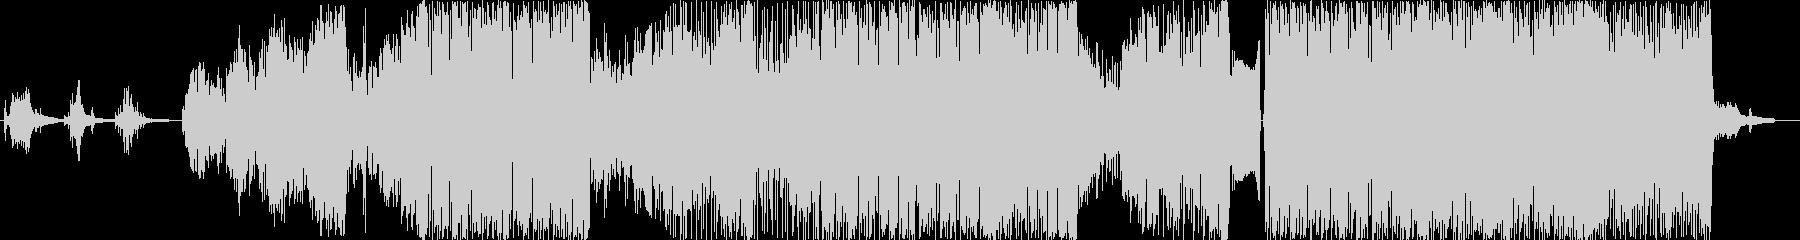 CHUの未再生の波形